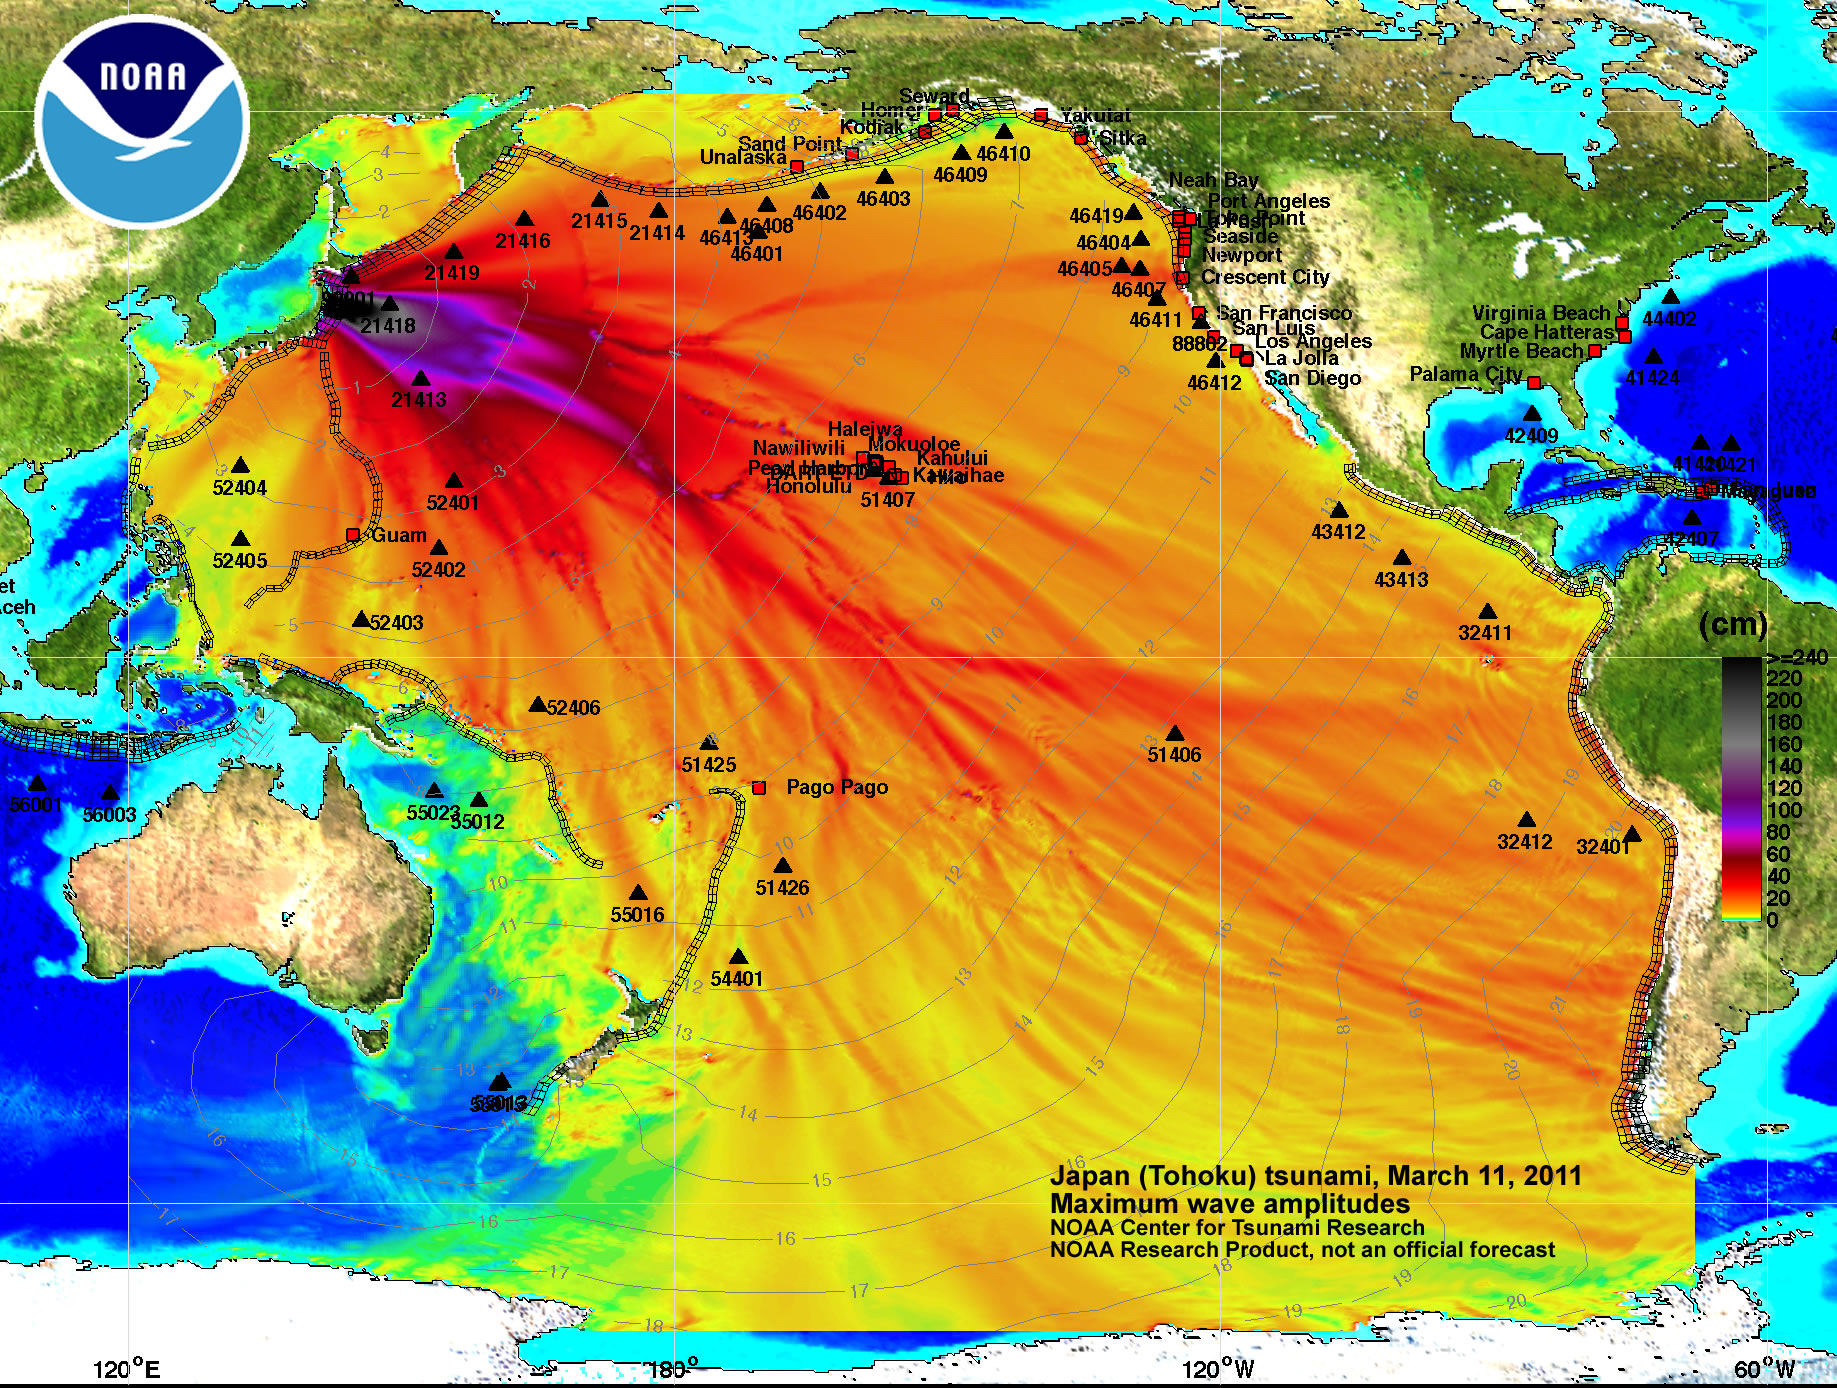 Tsunami Hunt: Studying Subduction Zone Faults for Preparedness